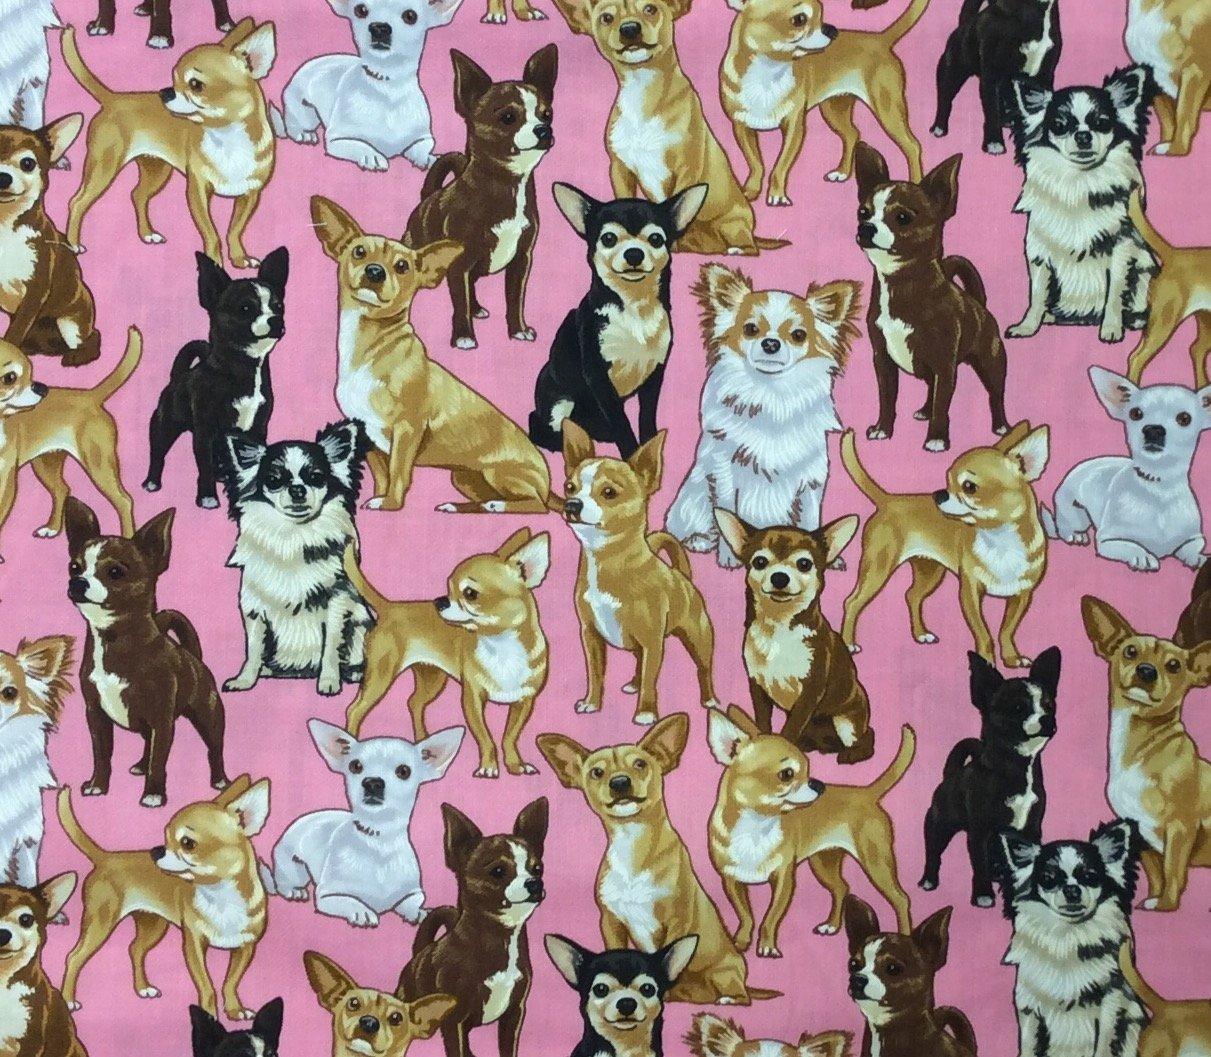 Puppy Dog Cute Fun Chihuahua Dog Cotton Quilt Fabric CHE021